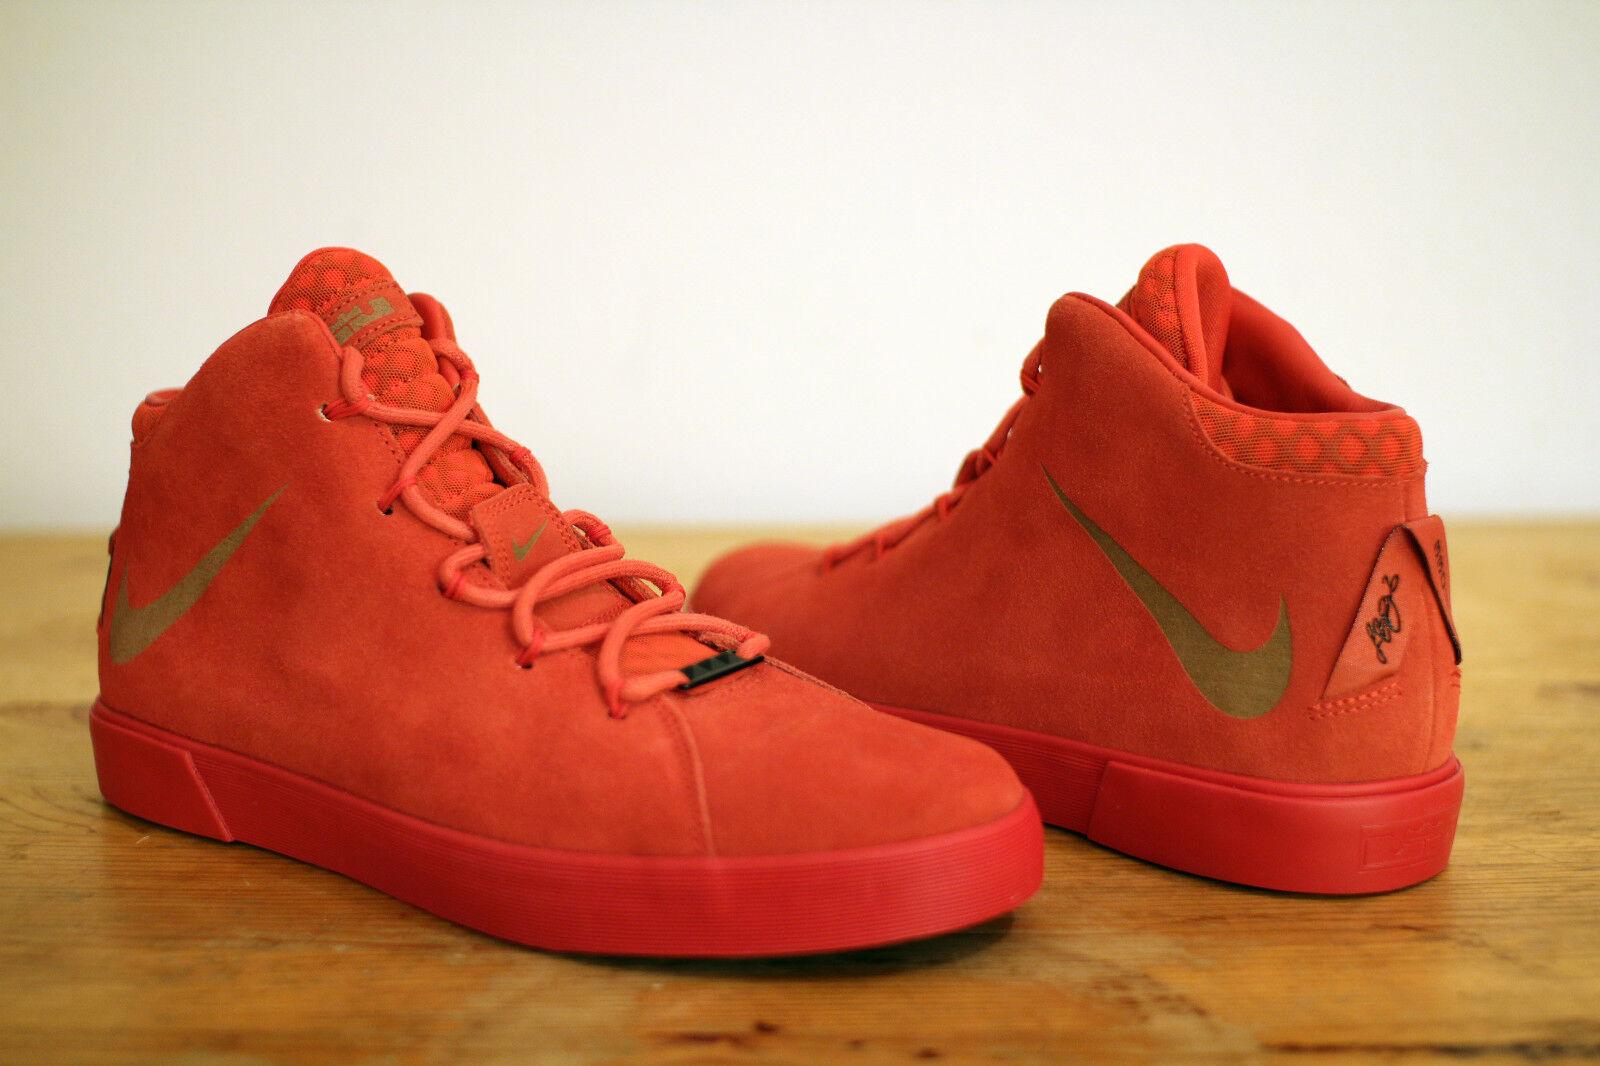 Nike Lebron XII NSW Lifestyle QS rojo Talla 41 UK 7 NEW & OVP Jordan